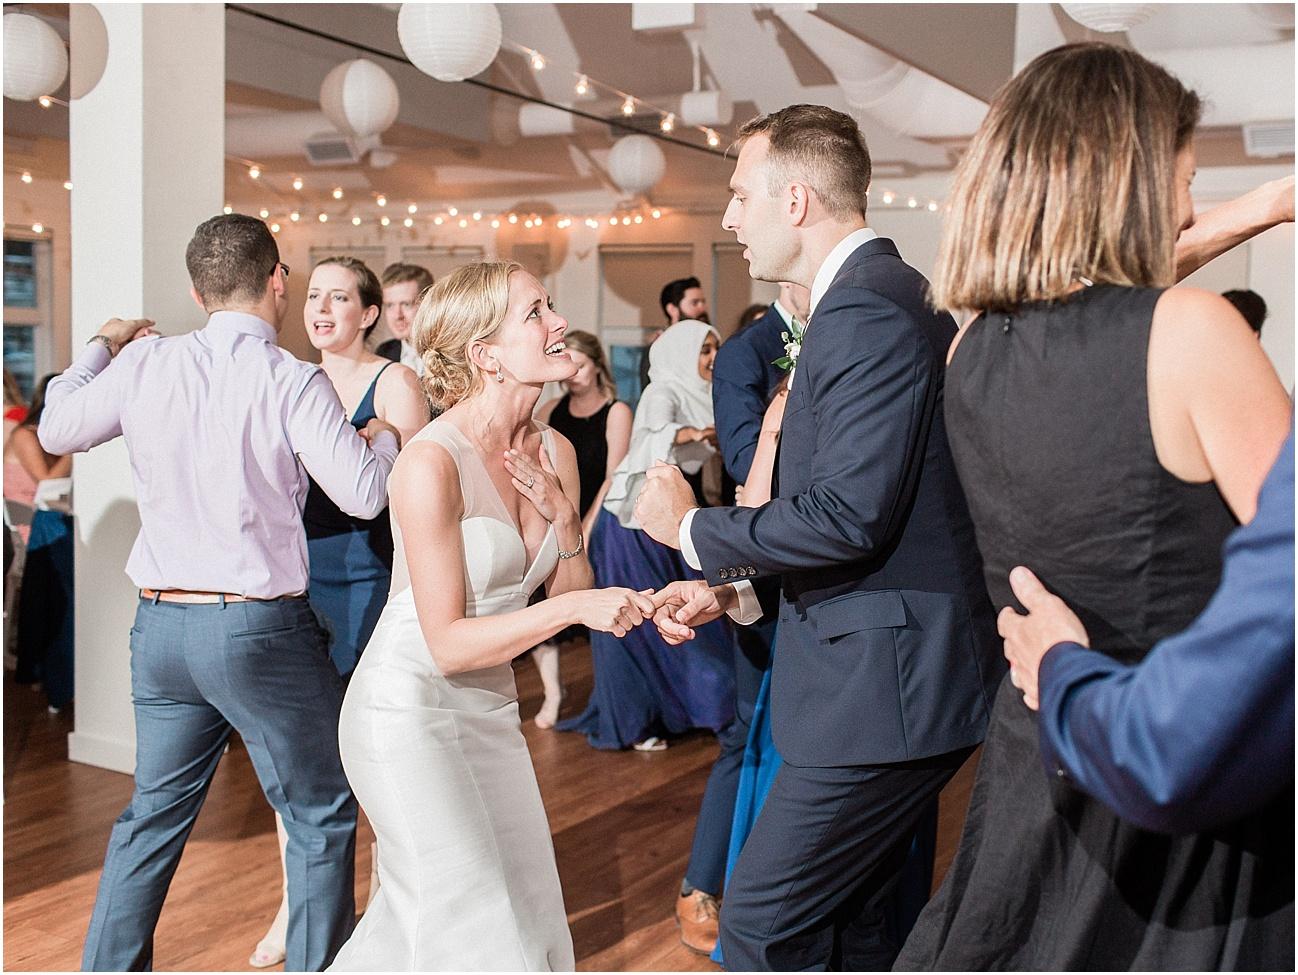 claire_gordon_duxbury_bay_maritime_school_beach_dock_powder_point_bridge_cape_cod_boston_wedding_photographer_meredith_jane_photography_photo_0623.jpg